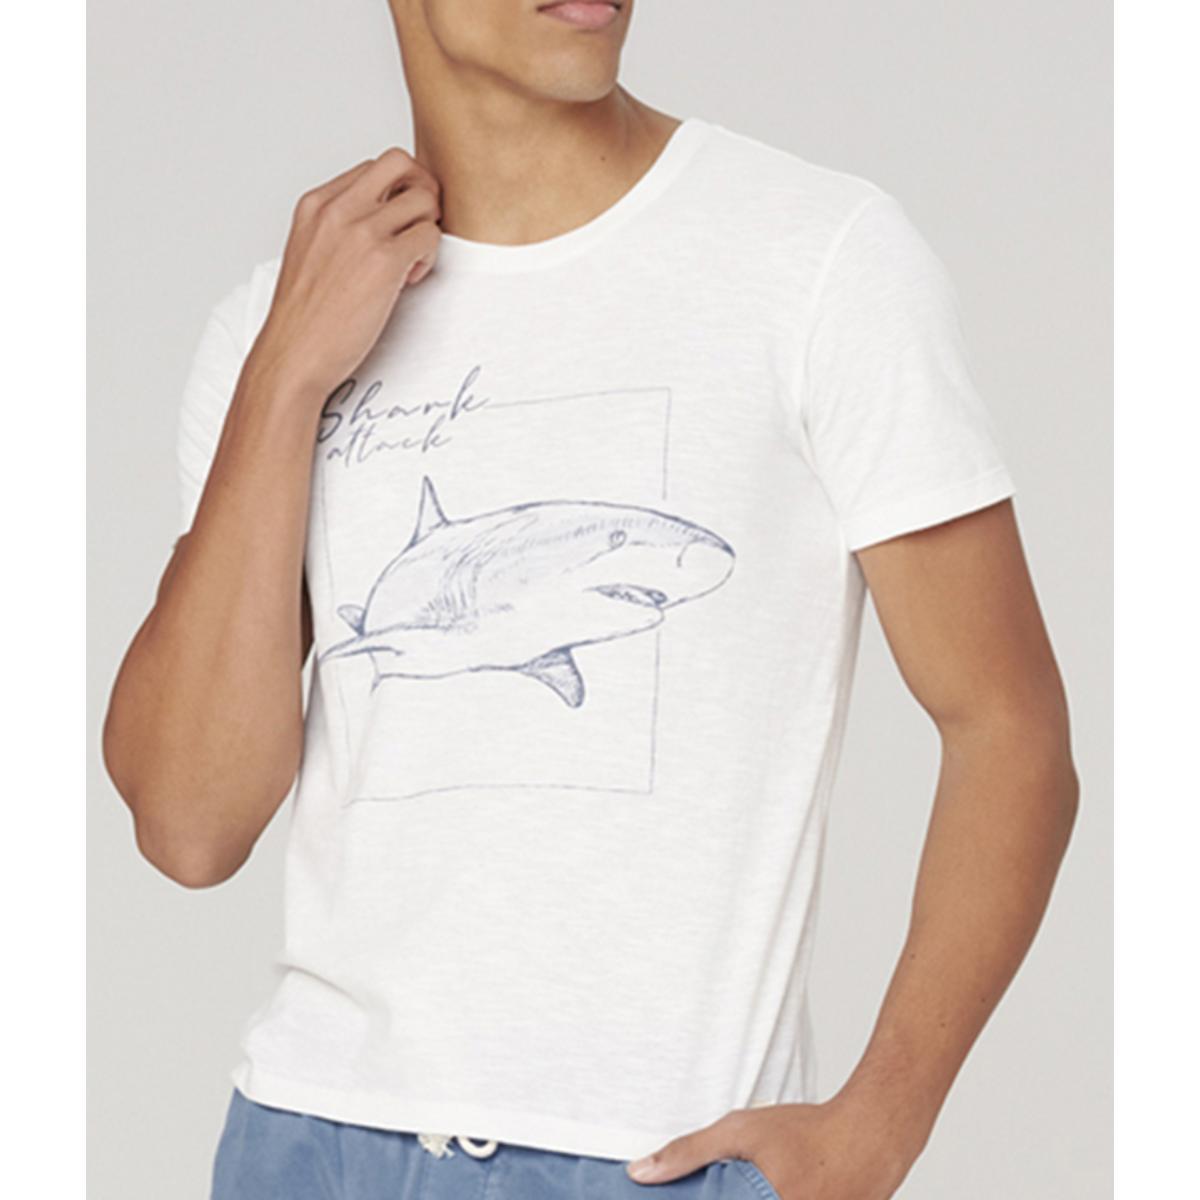 Camiseta Masculina Dzarm 6r7m Nmcen Off White